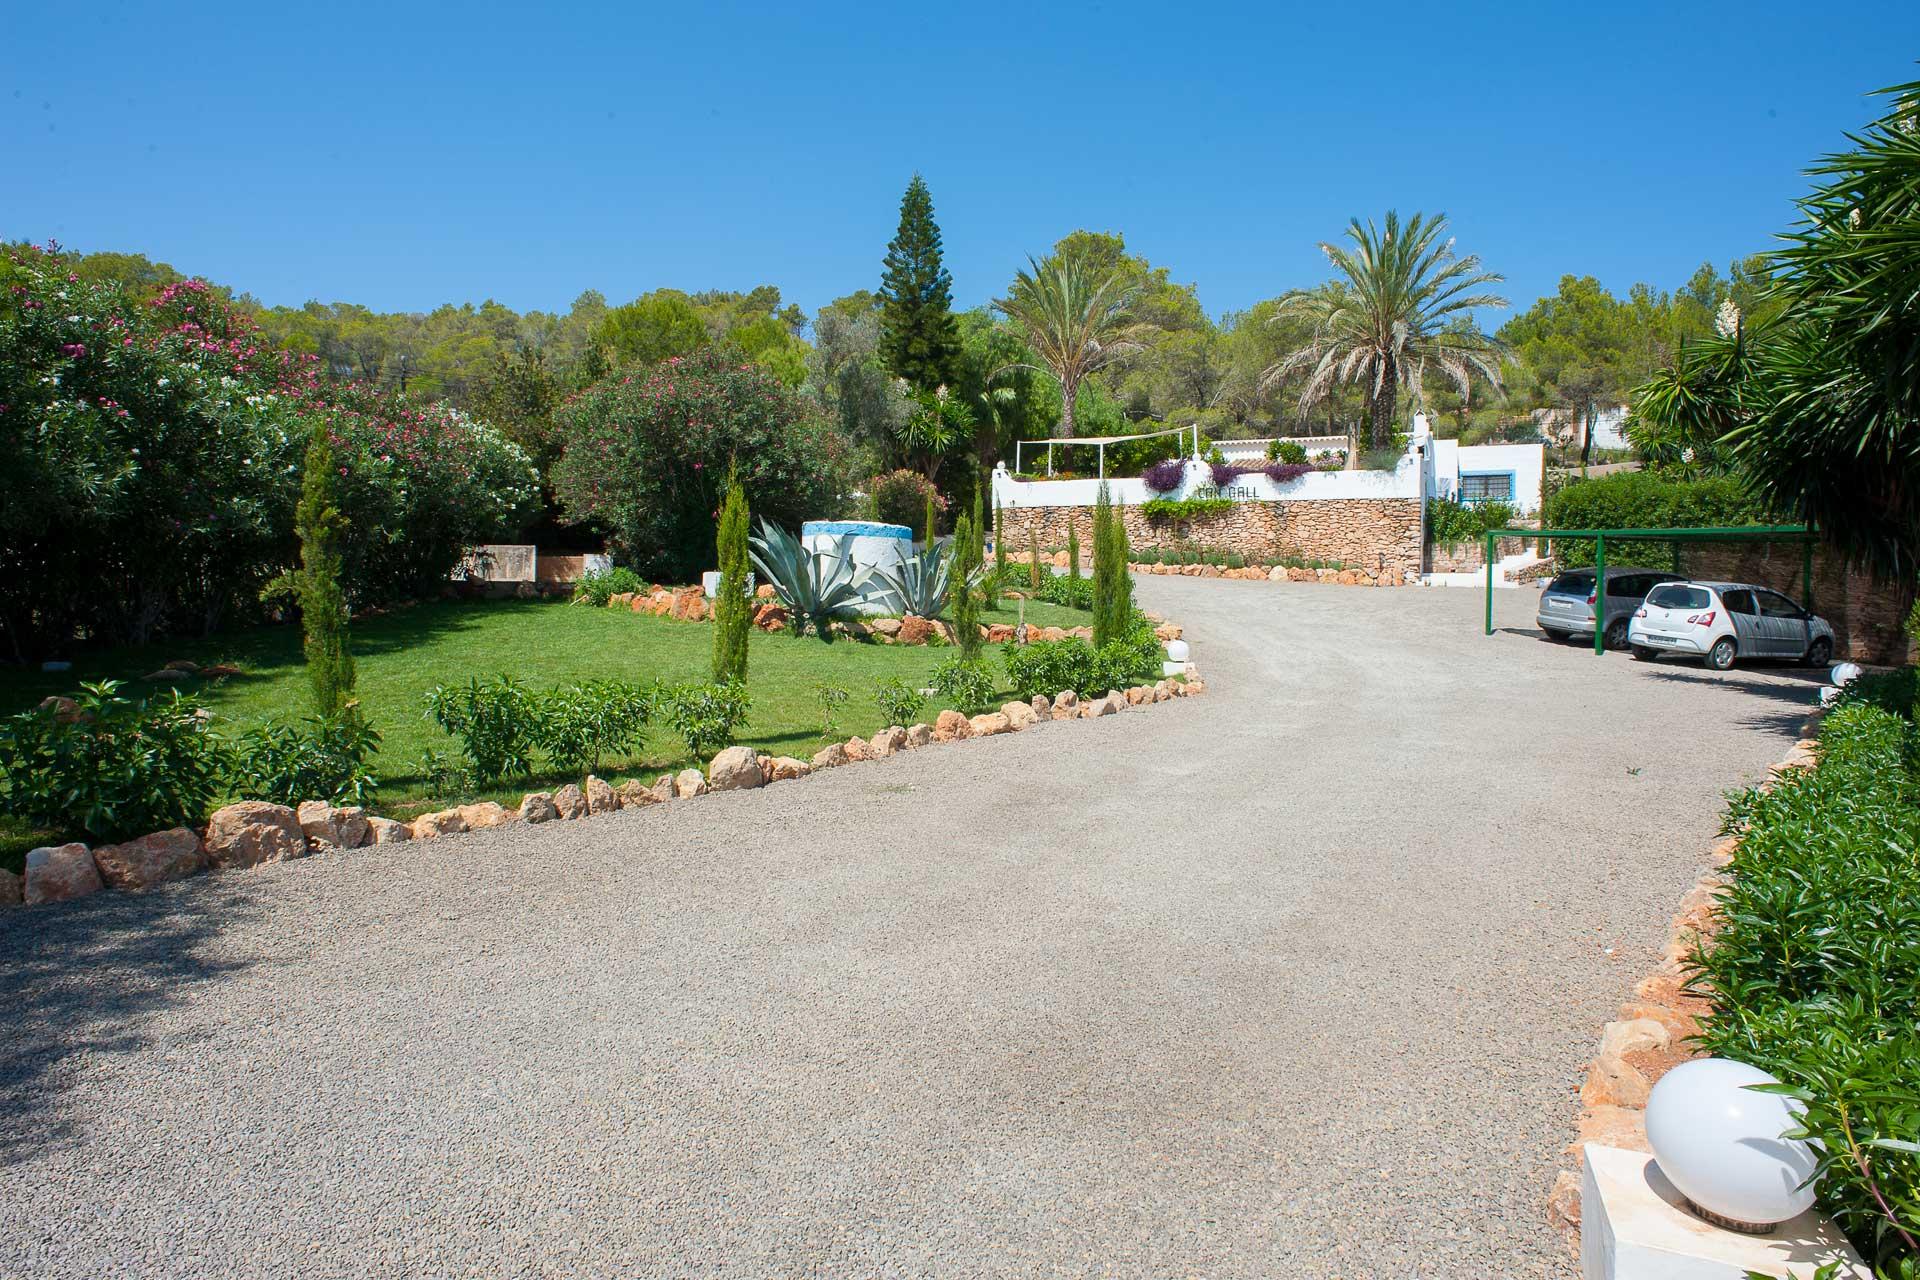 Finca Can Gall Ibiza - Courtyard with carport